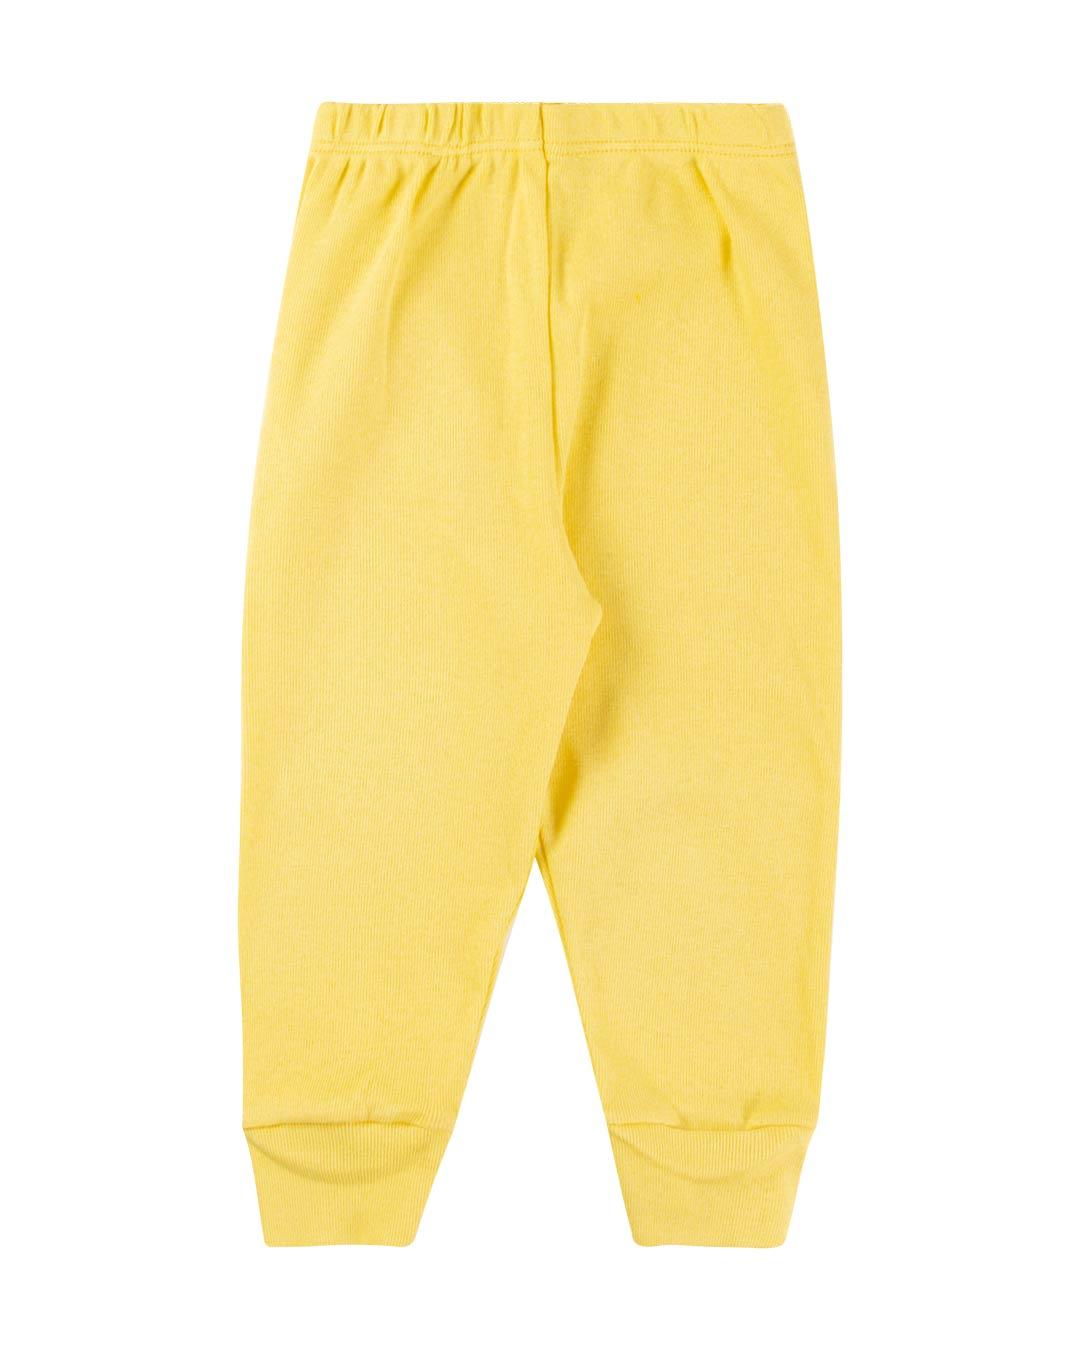 Kit 3 Mijões Básicos Amarelo - Sorriso Kids